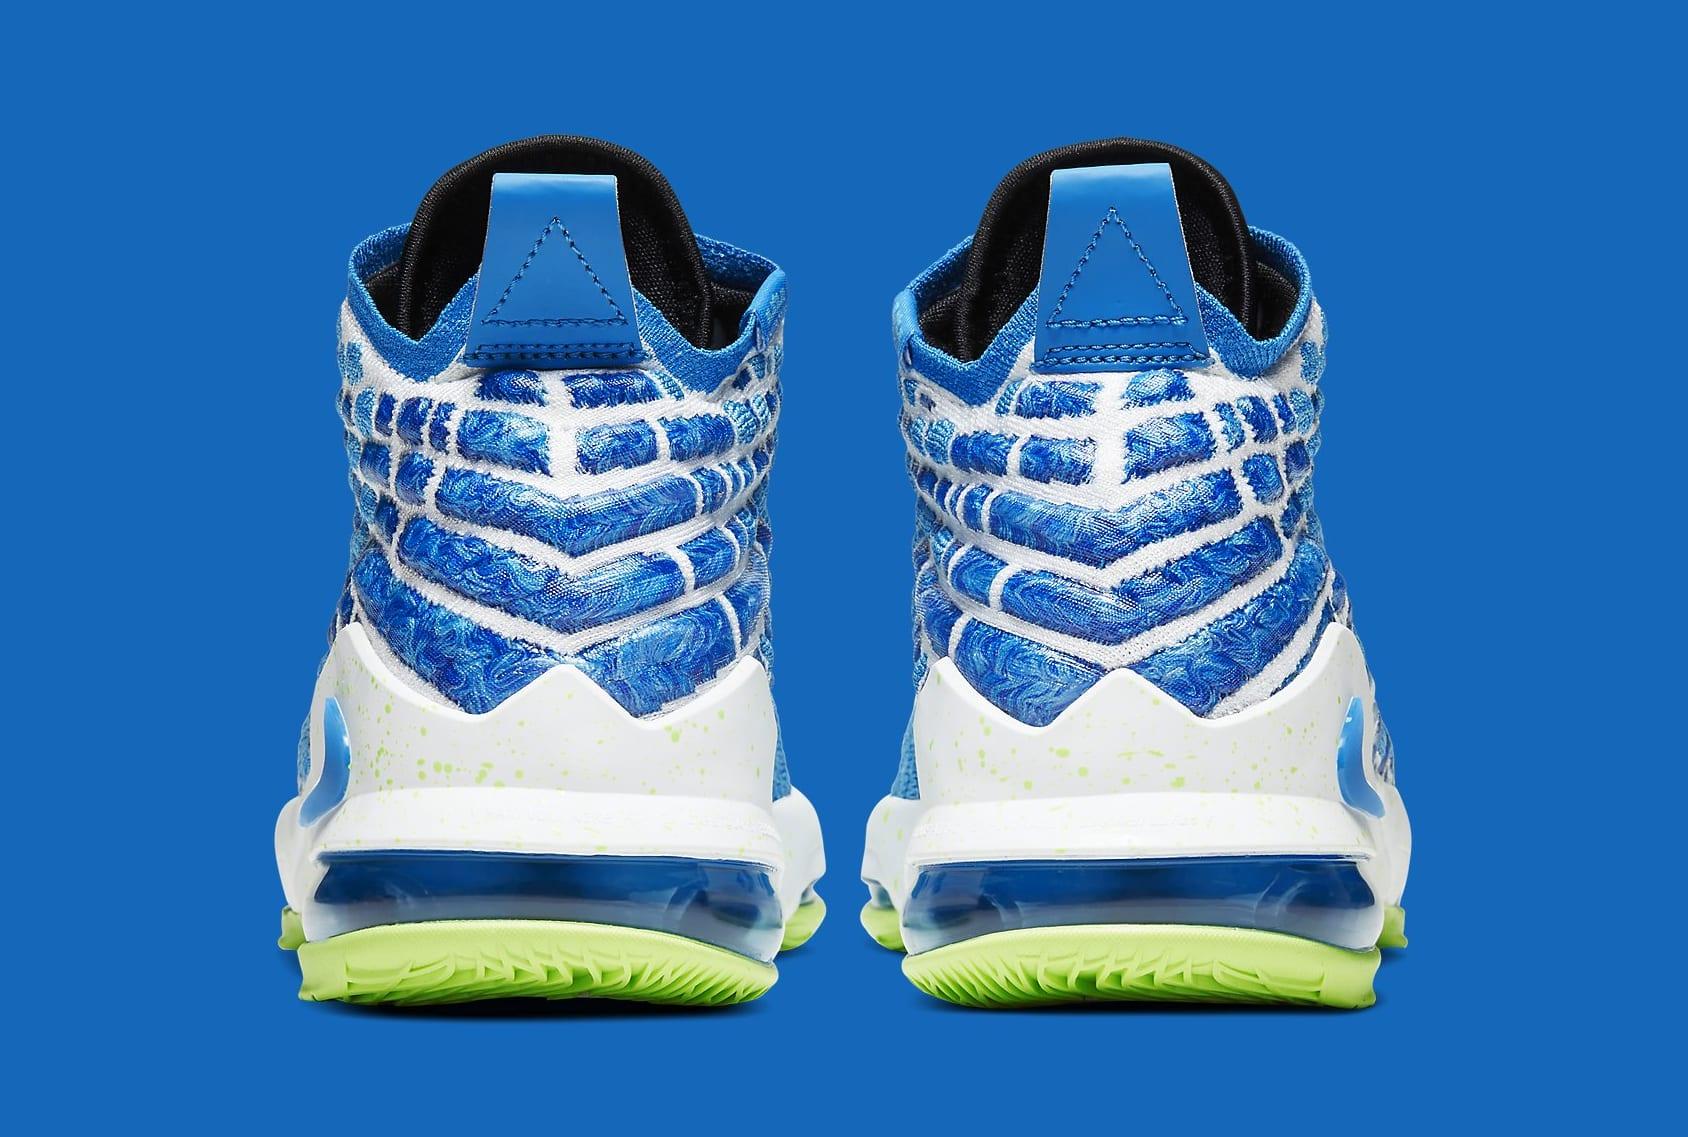 nike-lebron-17-gs-photo-blue-photo-blue-ghost-green-bq5594-434-heel